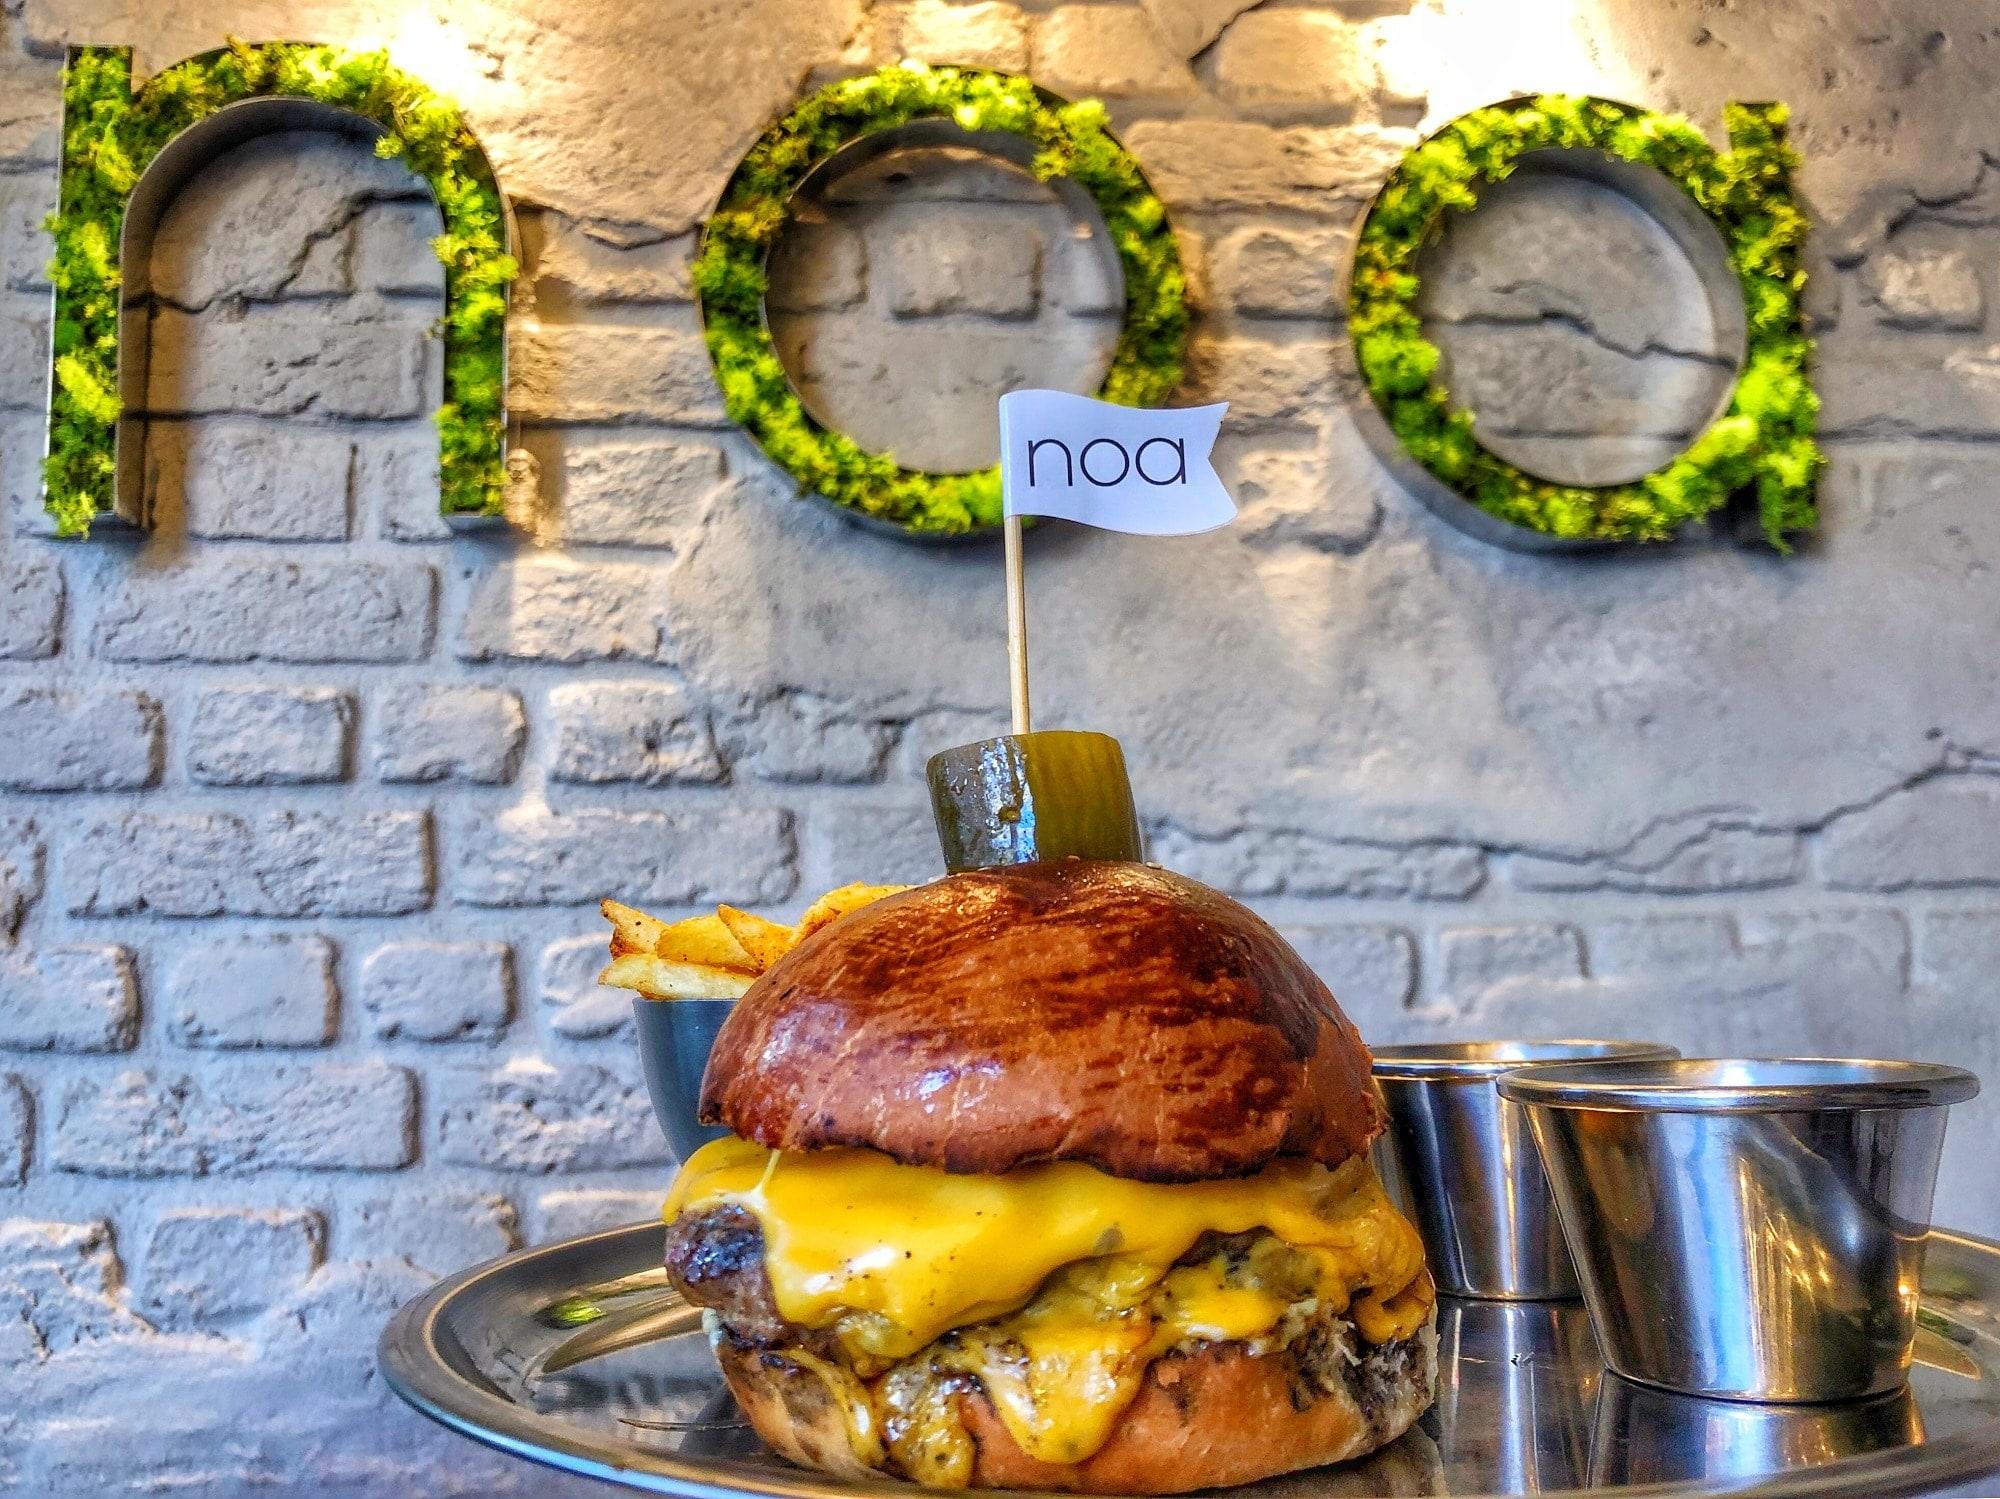 Noa Burger, Beşiktaş